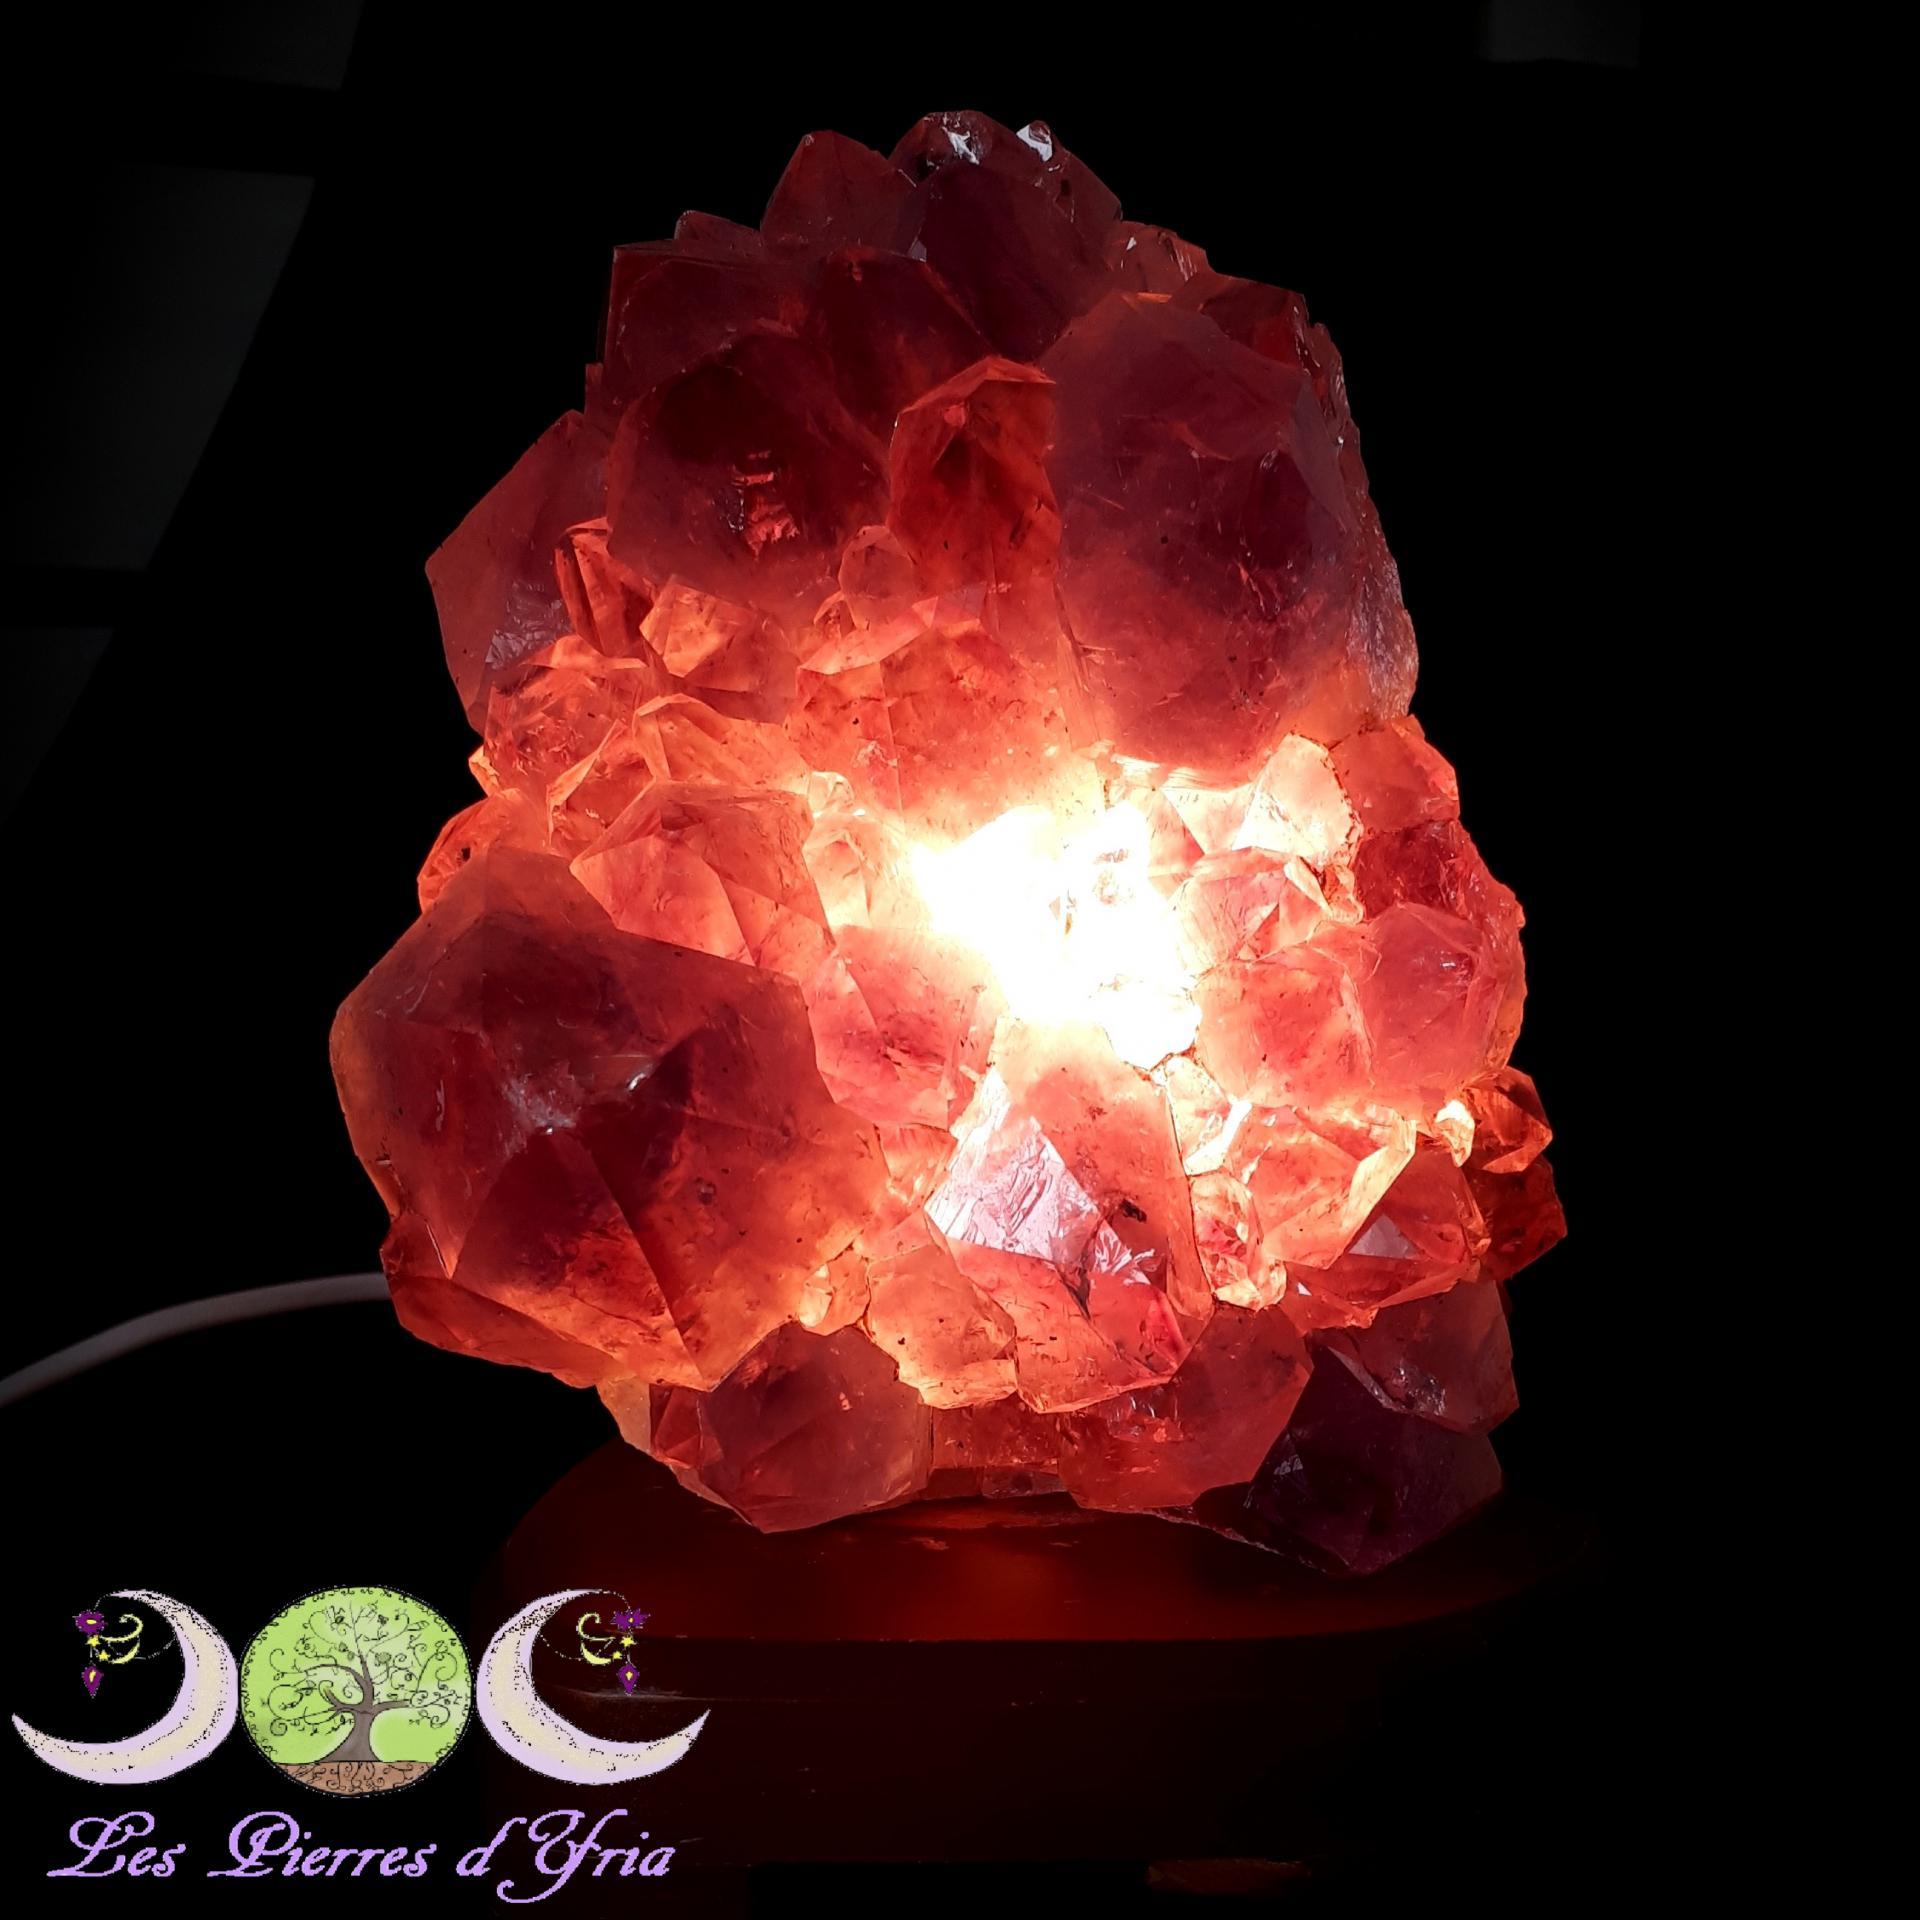 Lampe 1 2 gf